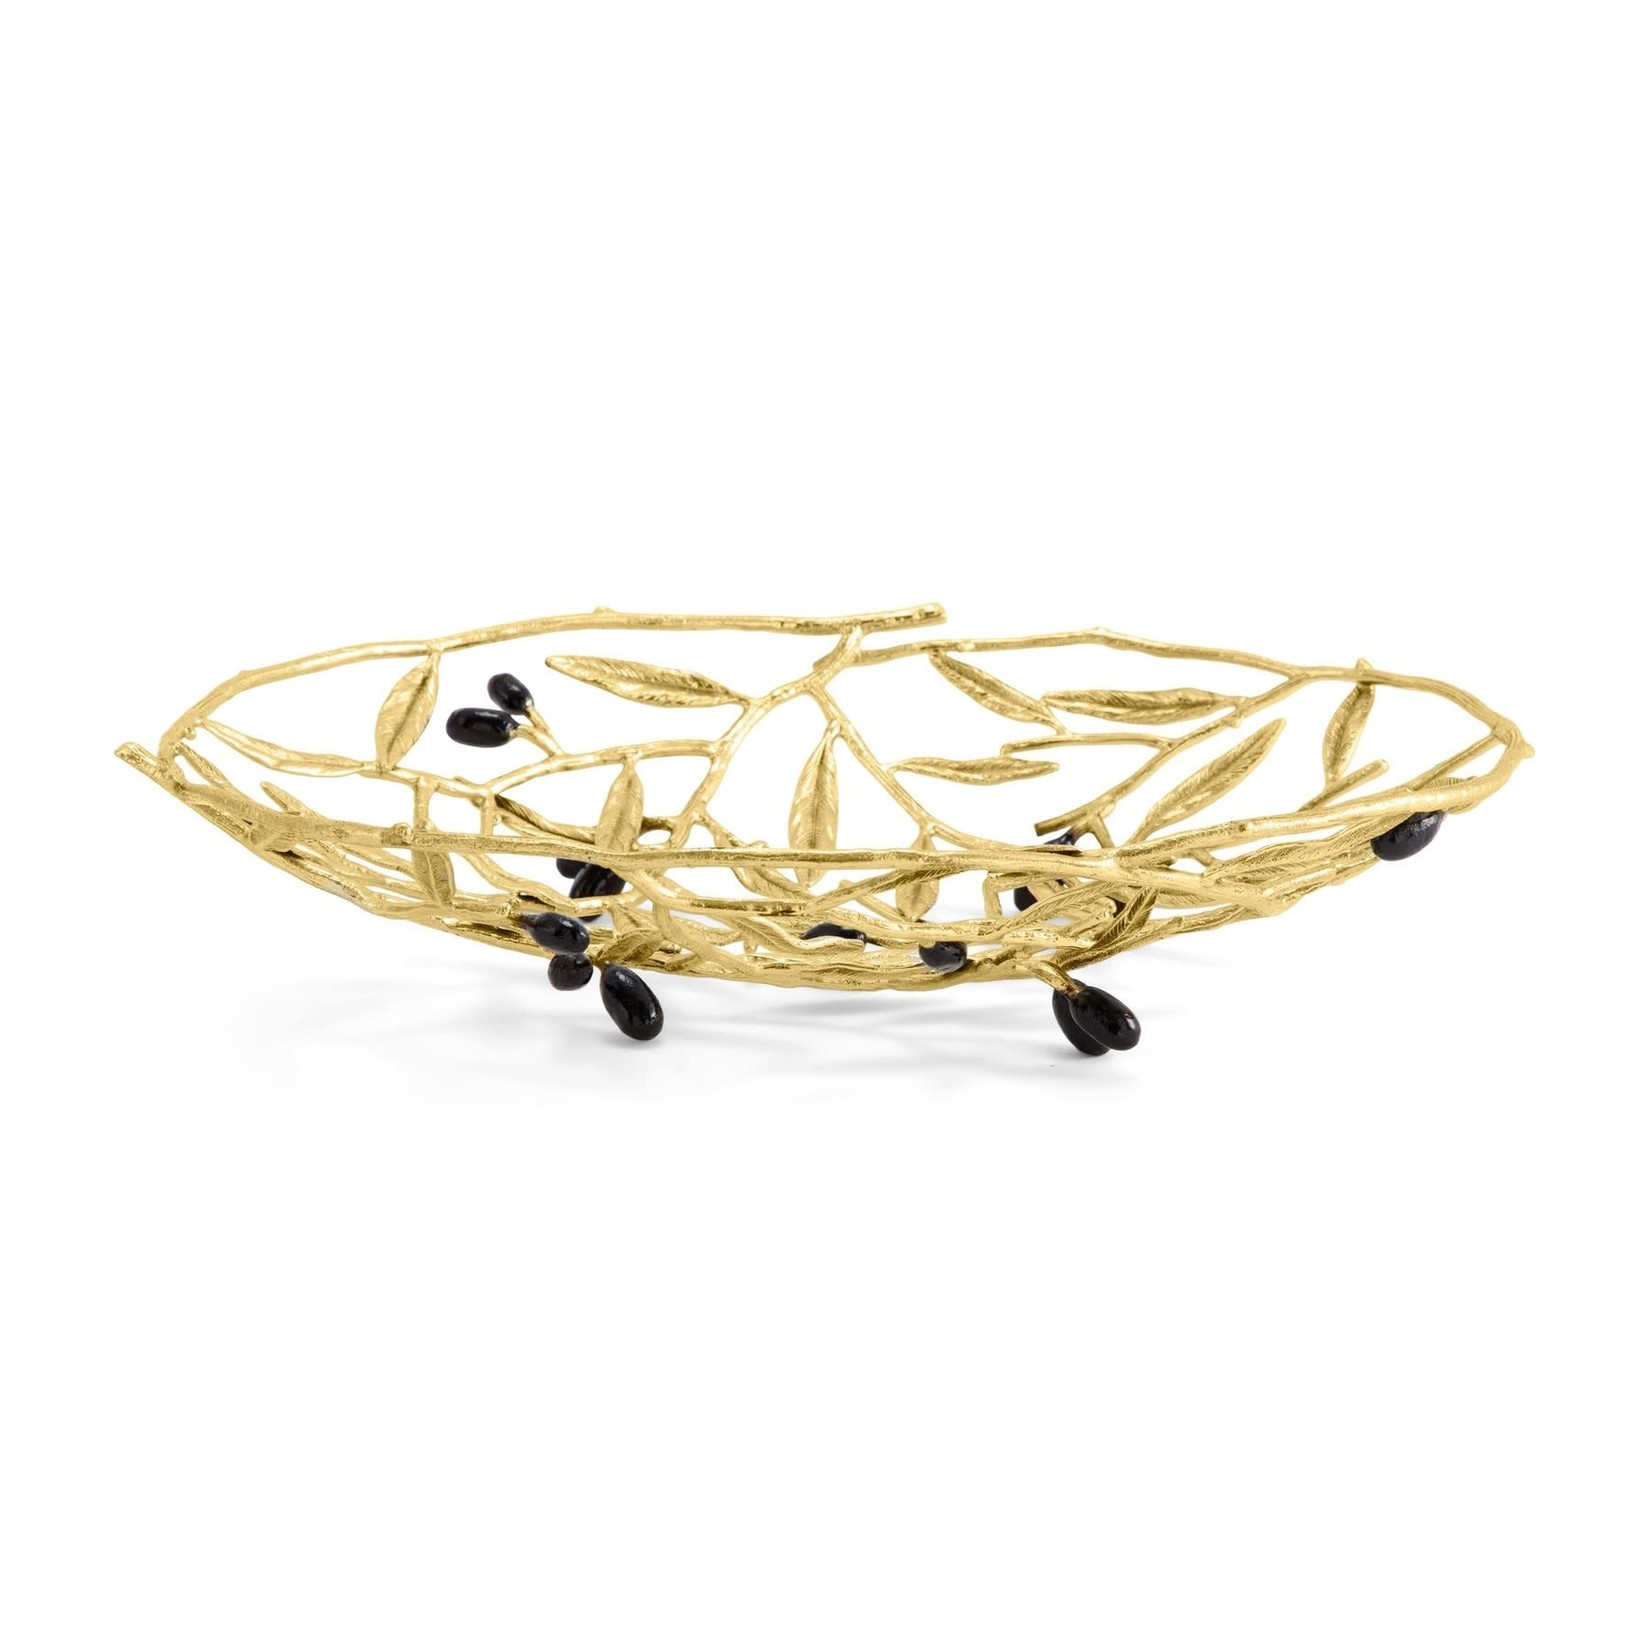 Michael Aram Olive Branch Bread Basket